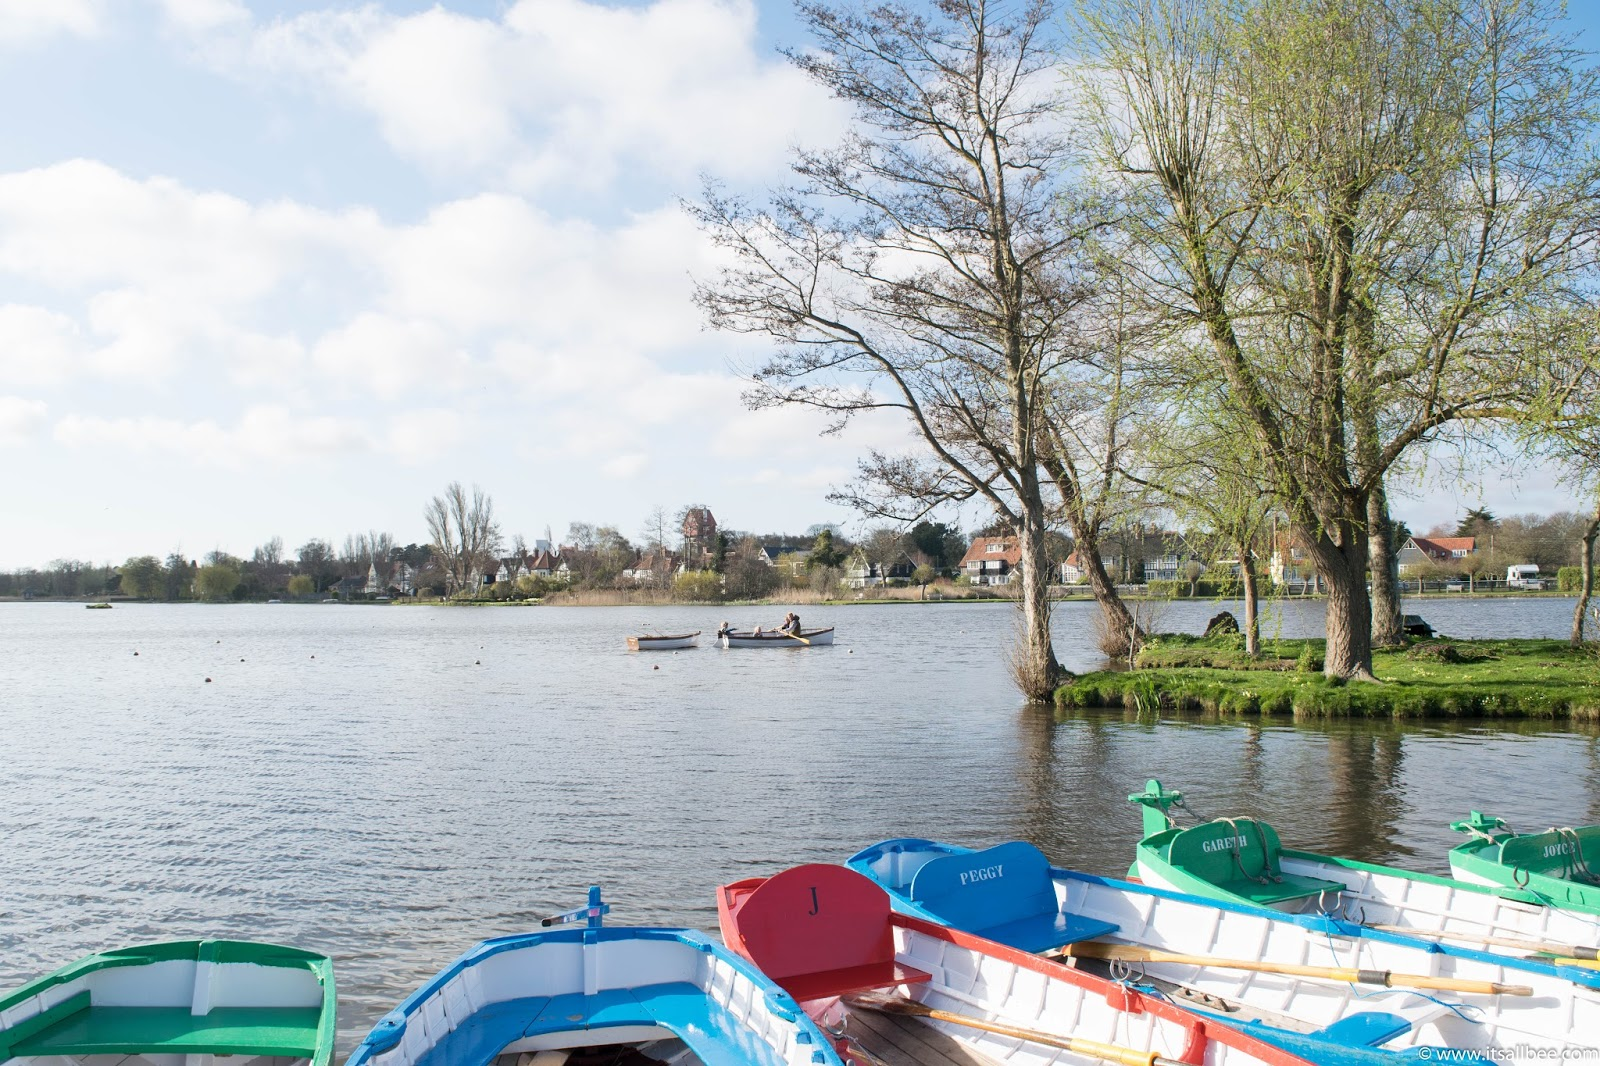 Thorpeness Boats | Thorpeness Boating Lake | Thorpeness Lake | Thorpeness Village